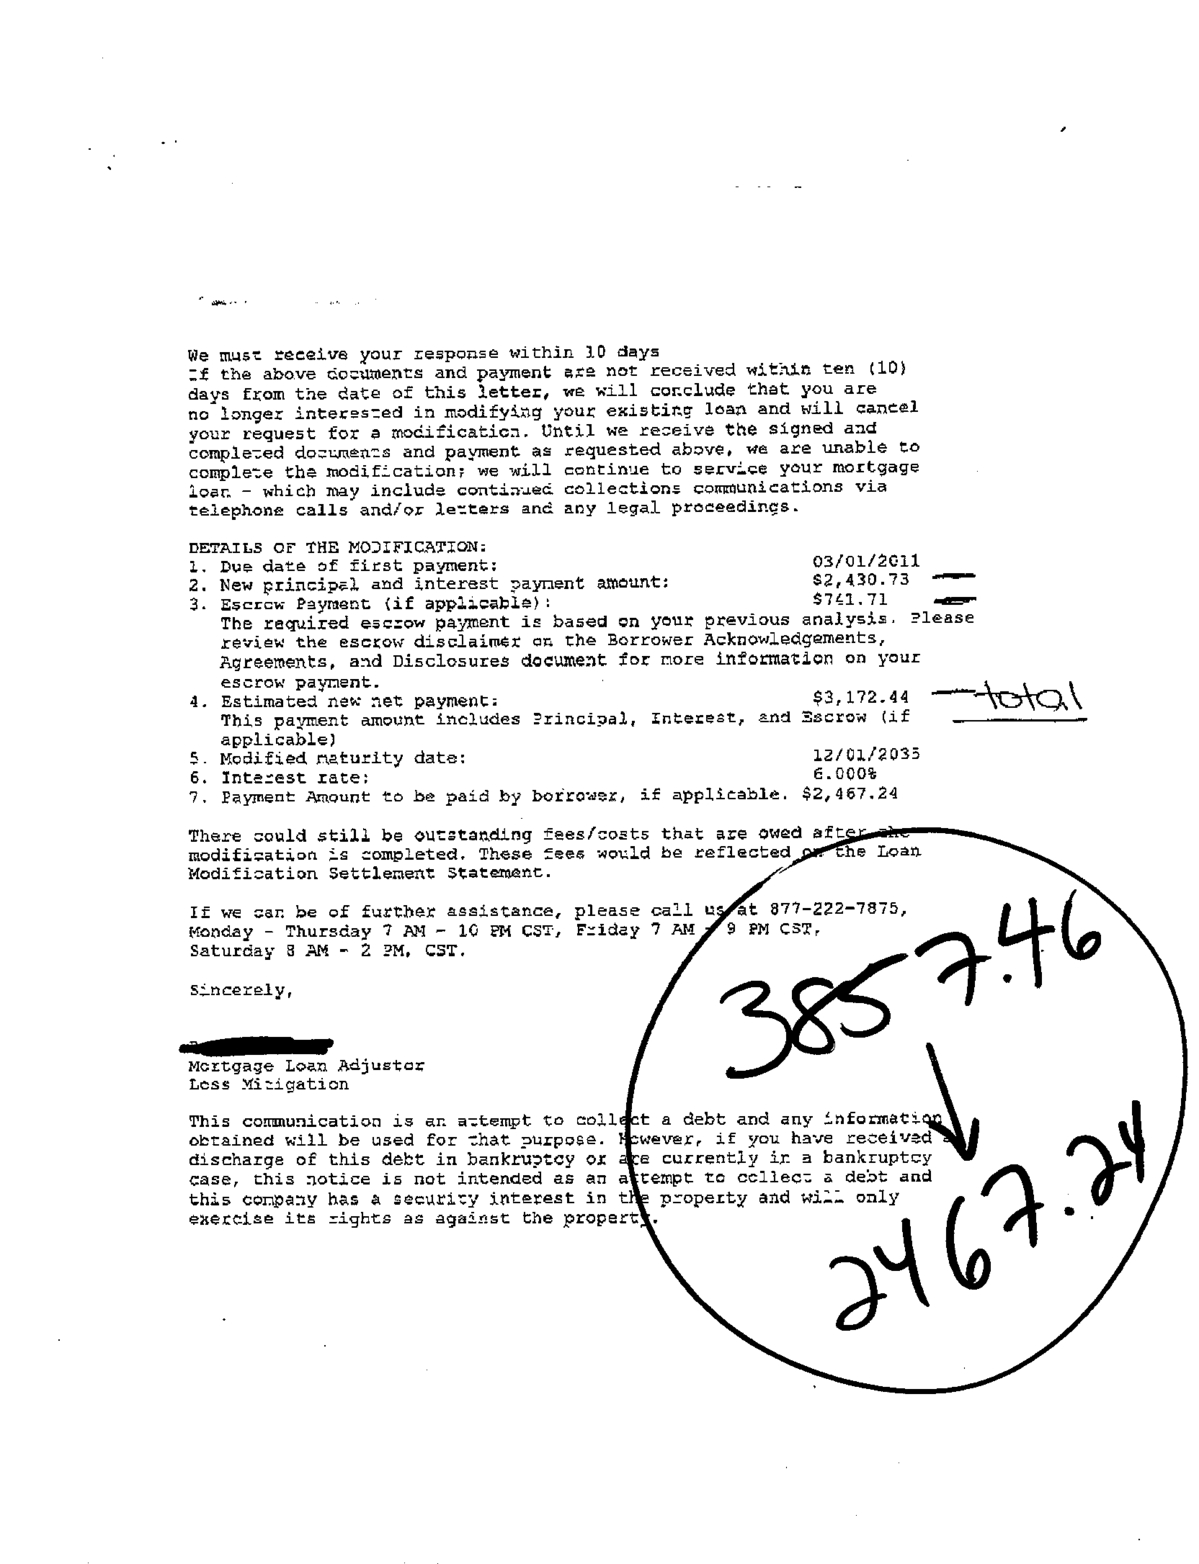 Loan Modification Results Loan Modification Attorneys Sj Packman